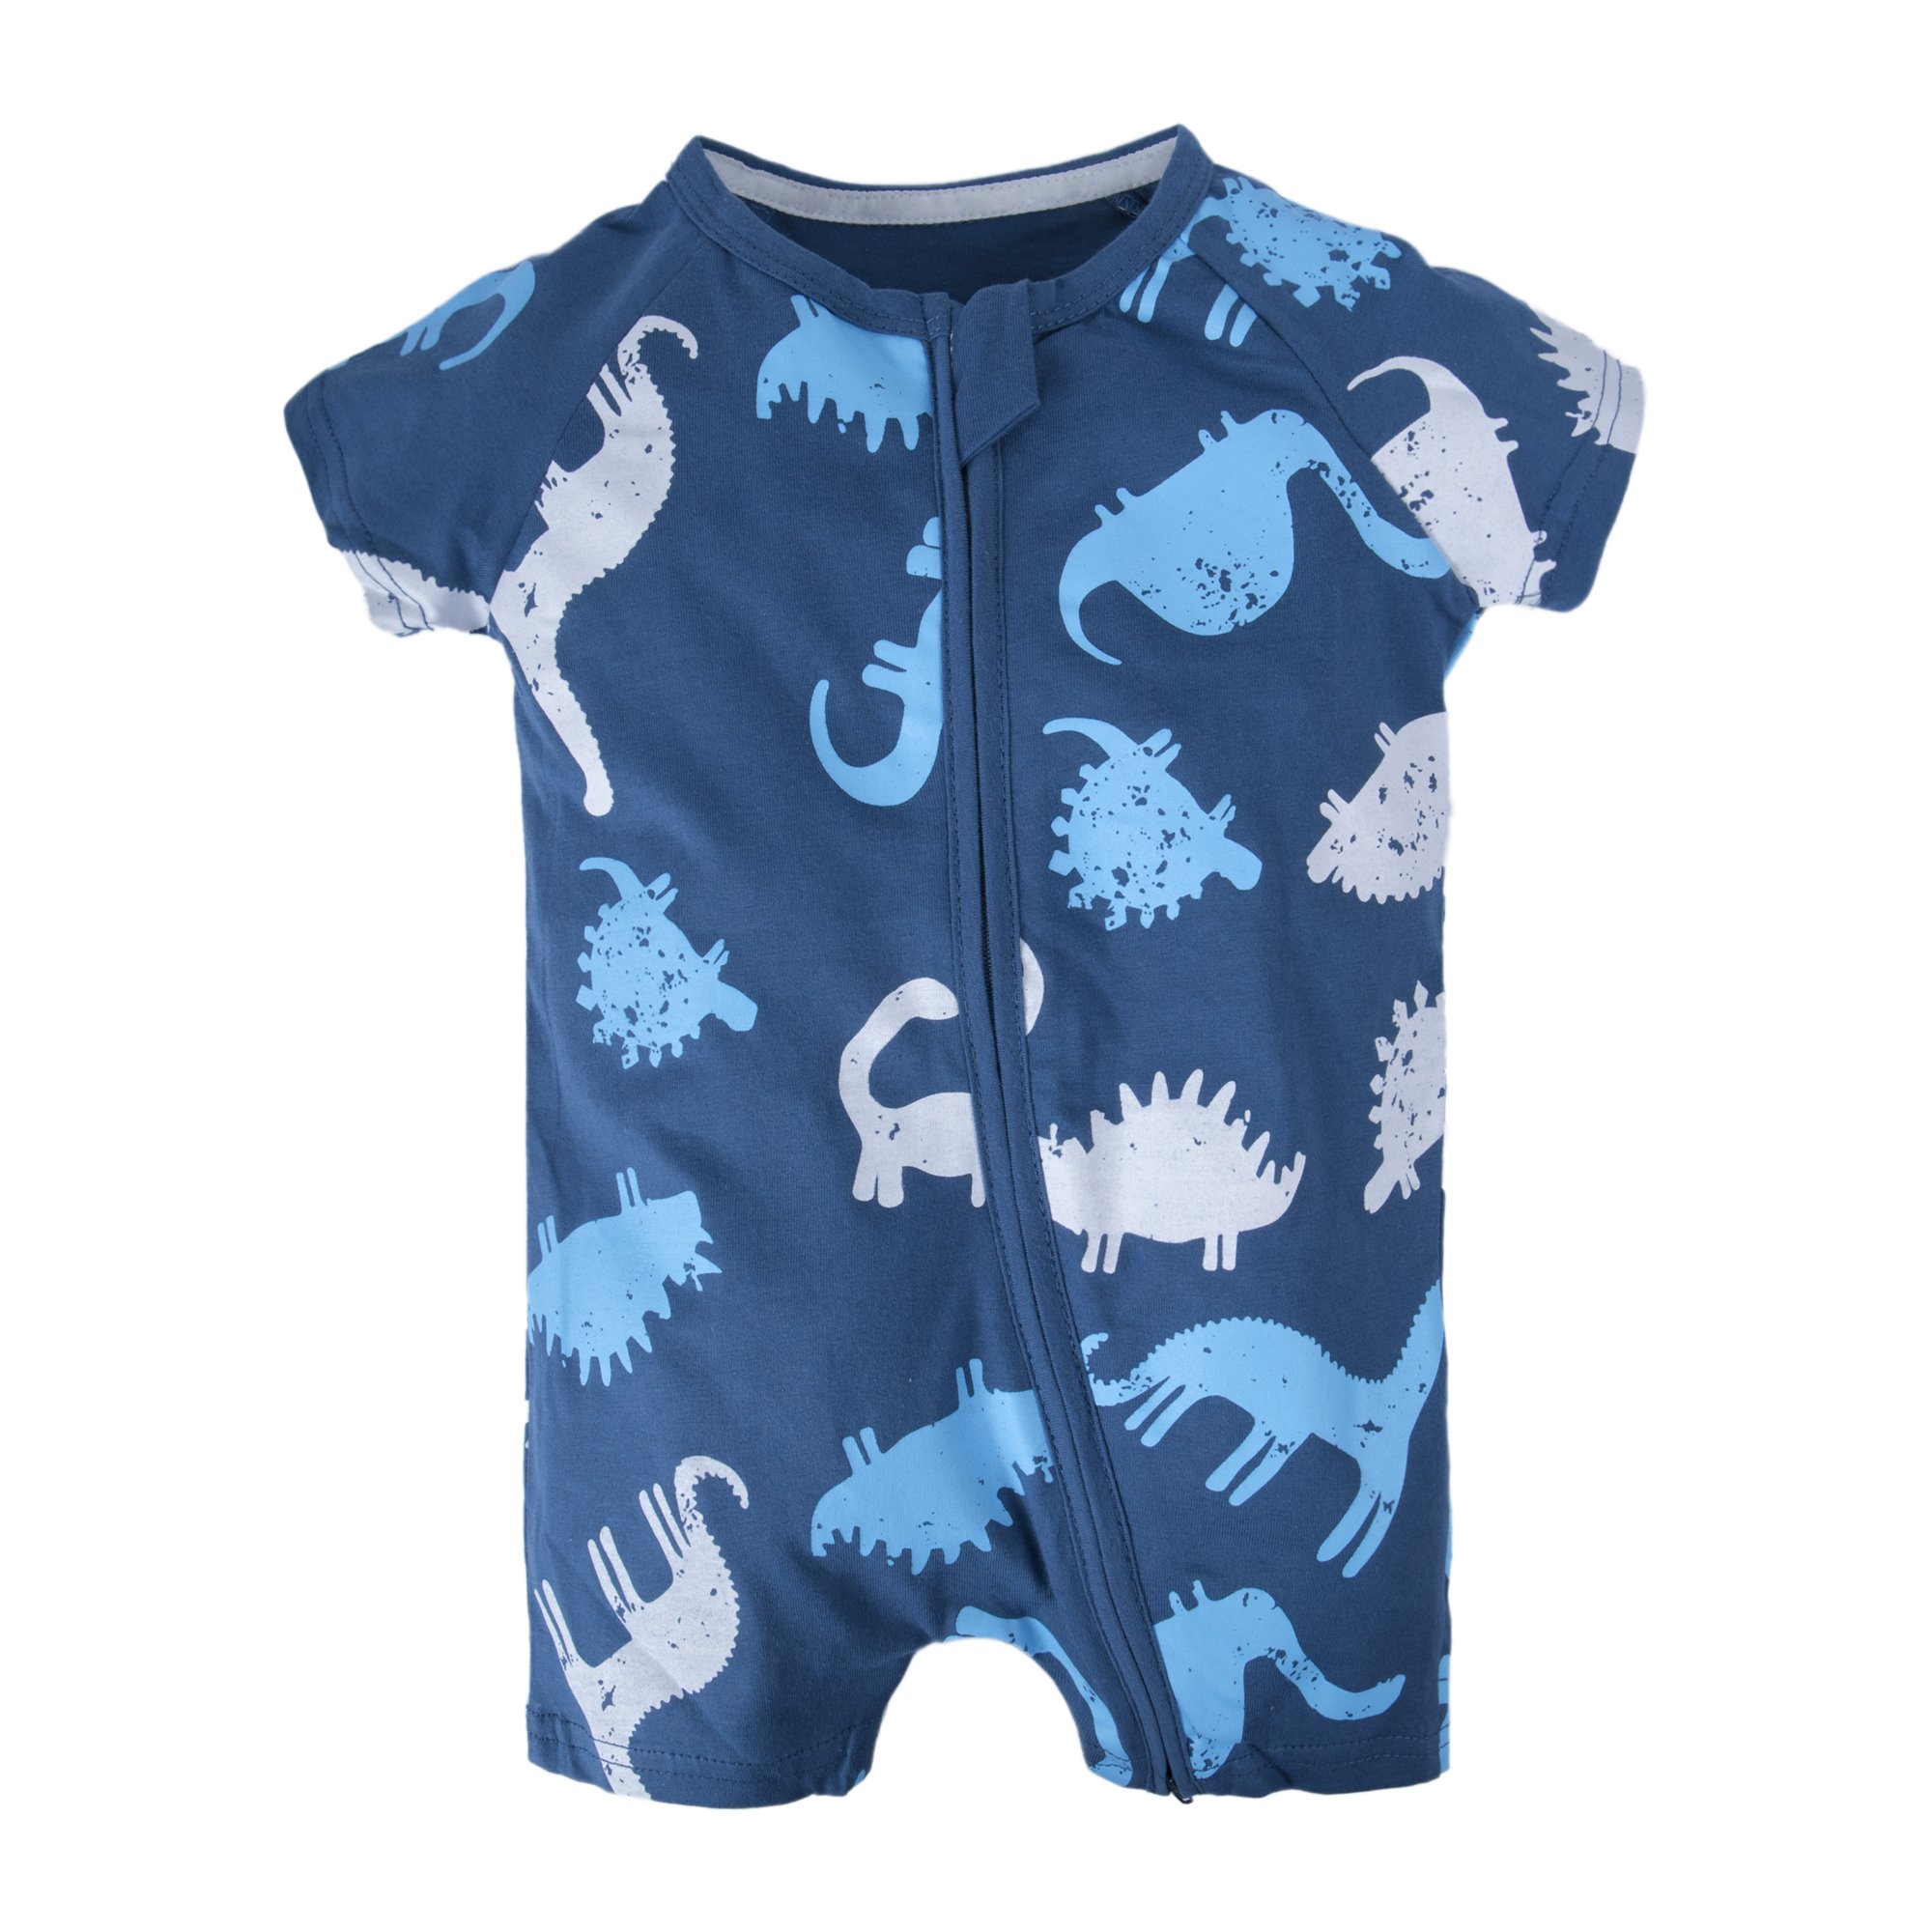 BIG ELEPHANT Baby Boys'1 Piece Short Sleeve Pajama Dinosaur Print Zipper Romper Dinosaur Q11-80 9-12 Months